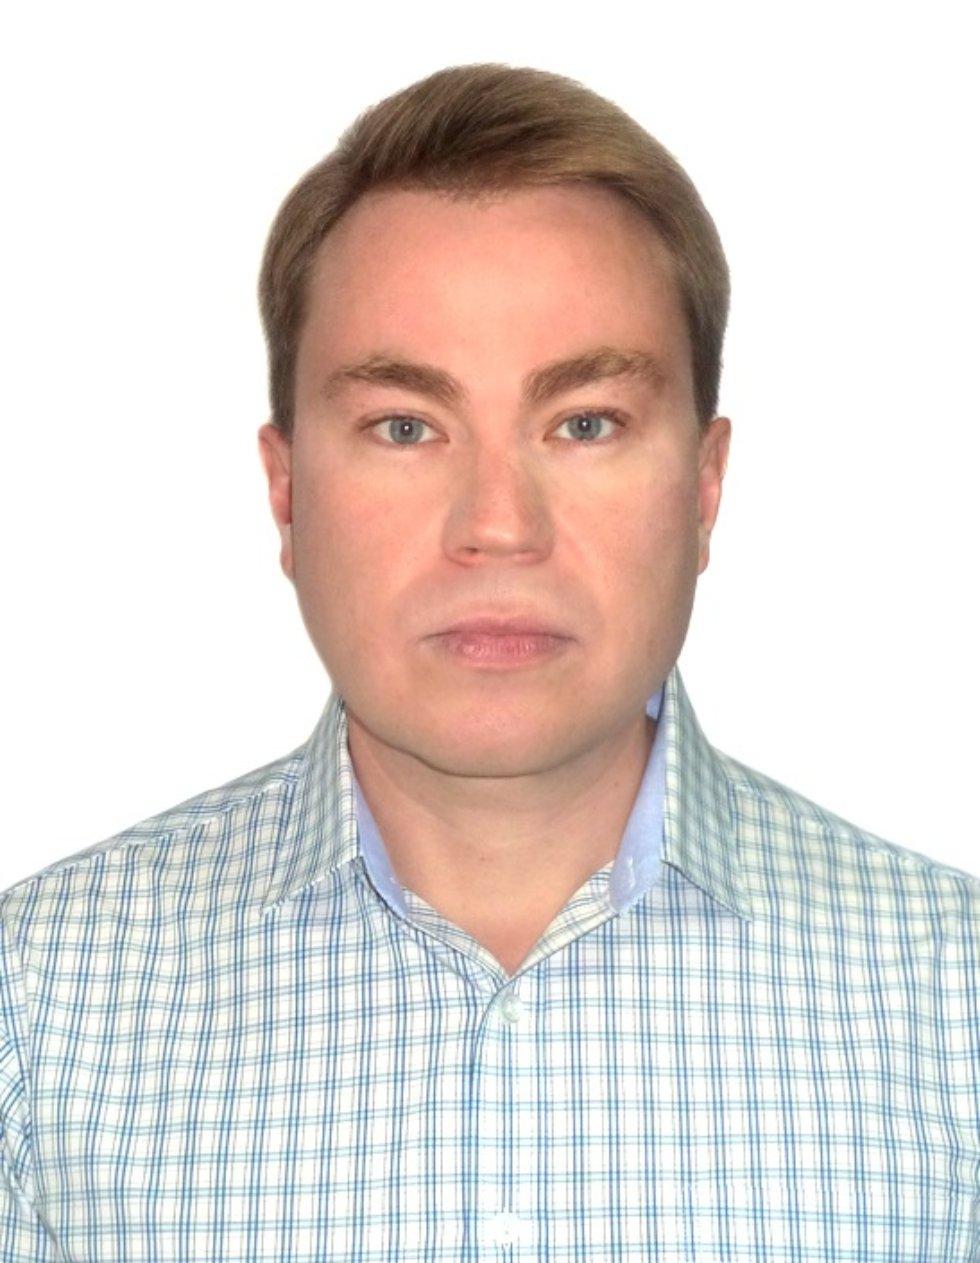 Demin Sergey Anatolievich